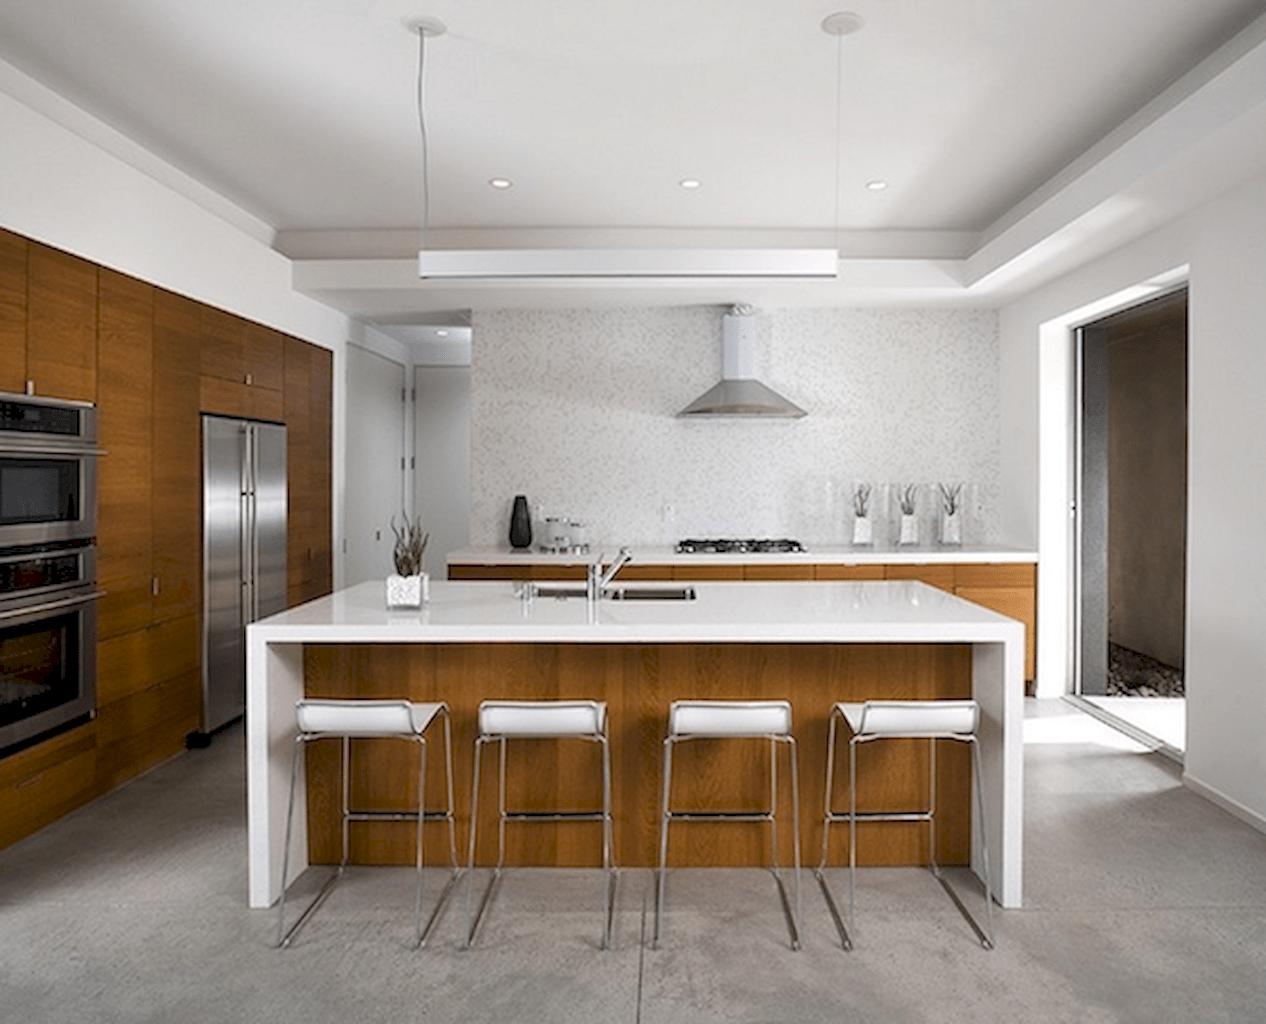 Mid century modern kitchen design ideas (10)